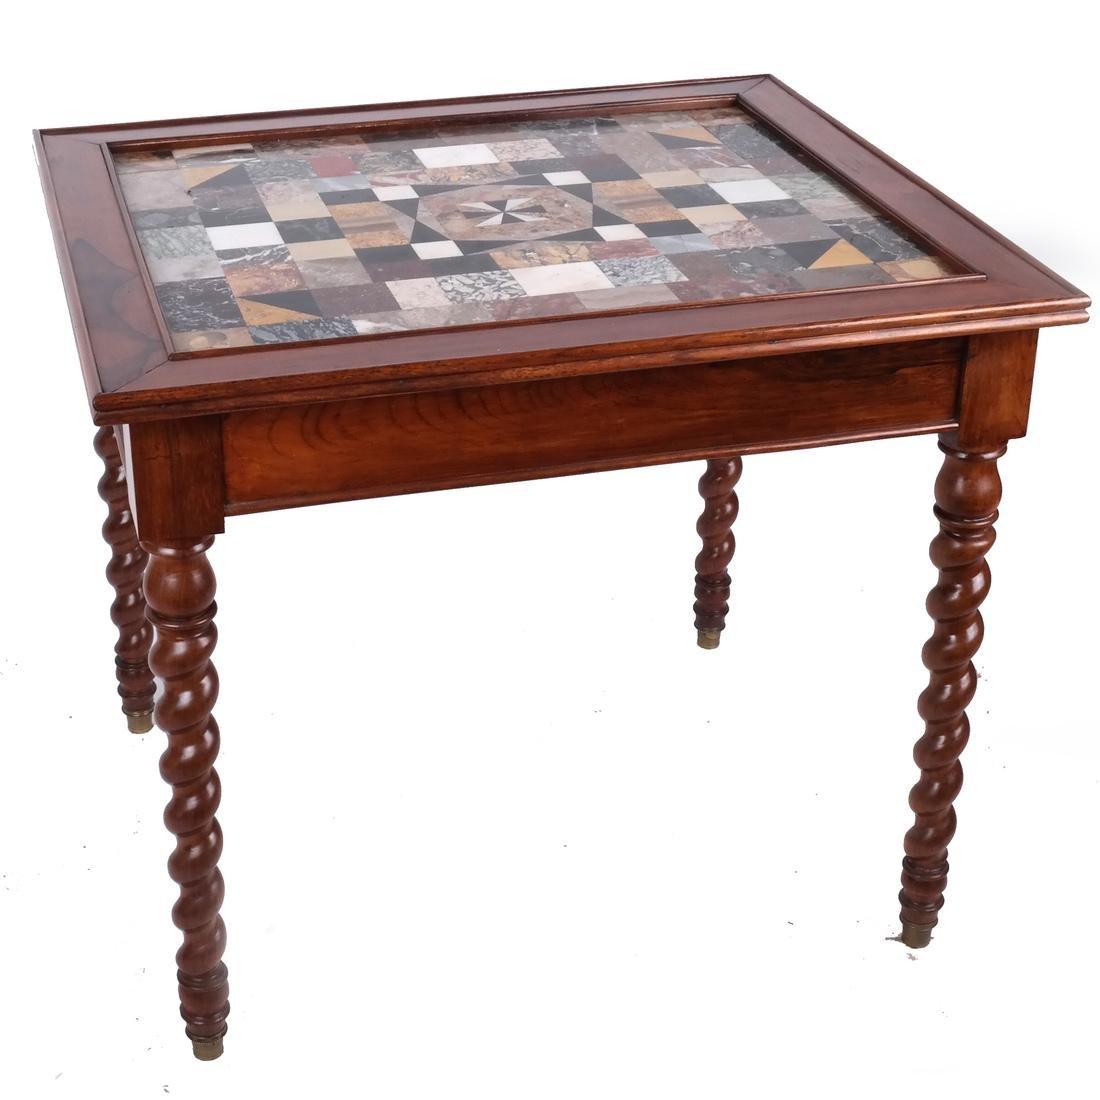 Antique Specimen Marble Top Table